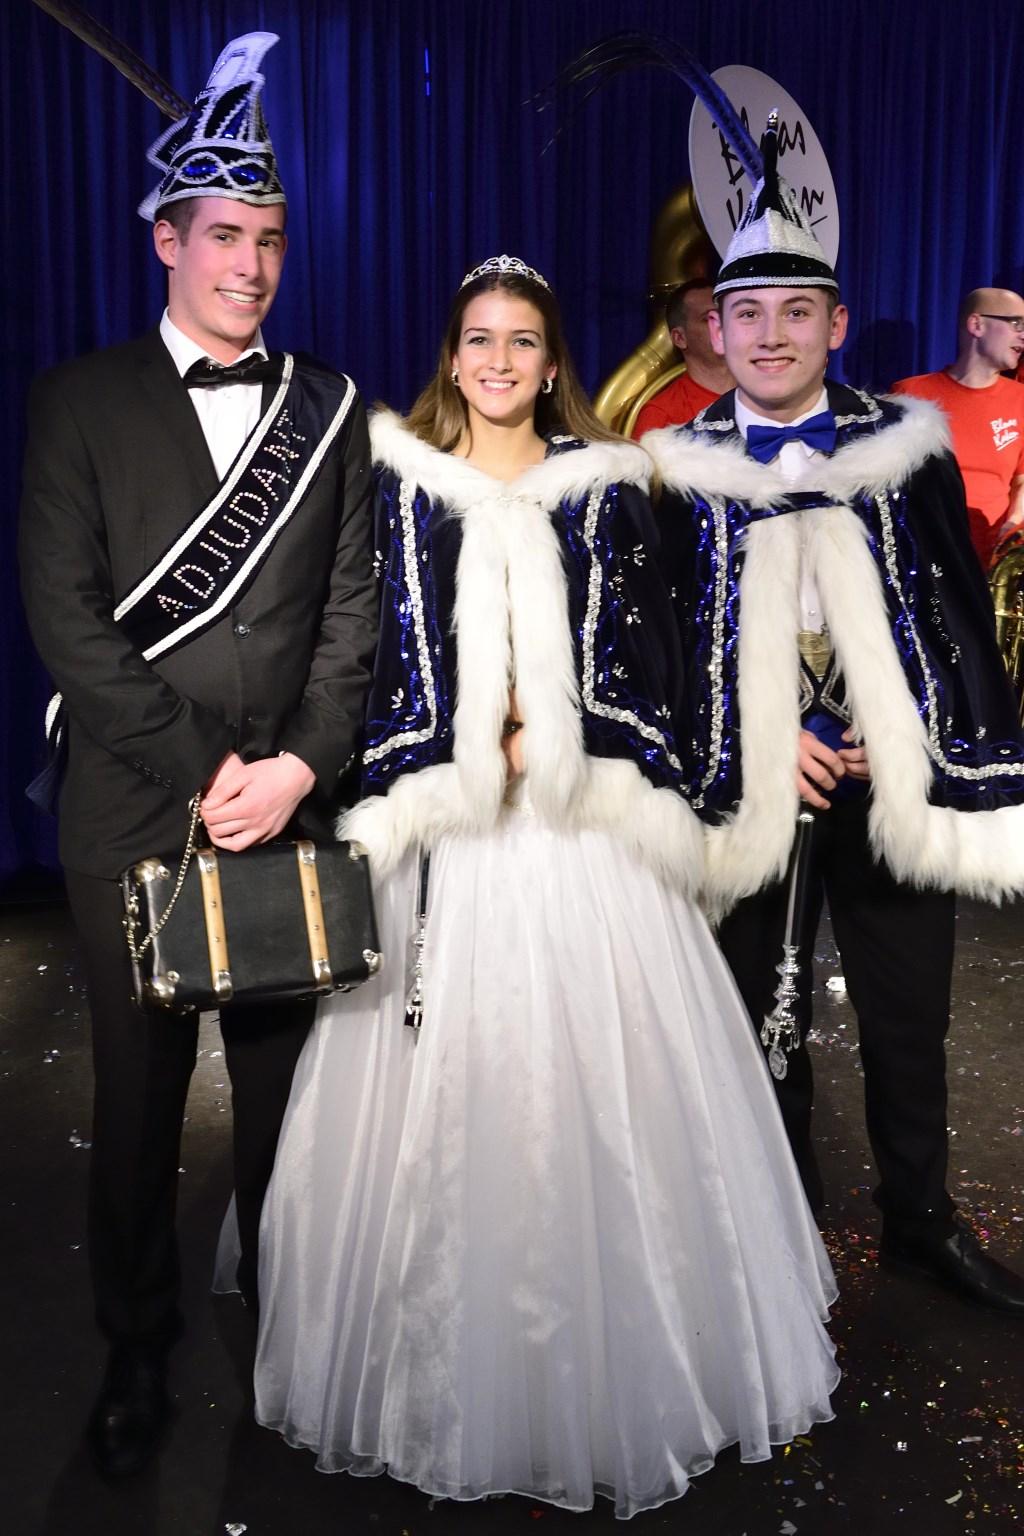 Jeugdprins Calvin en Jeugdprinses Rachelle samen met adjudant Jaimy Speetjens Foto: Wil Feijen © DeMooiSonenBreugelKrant